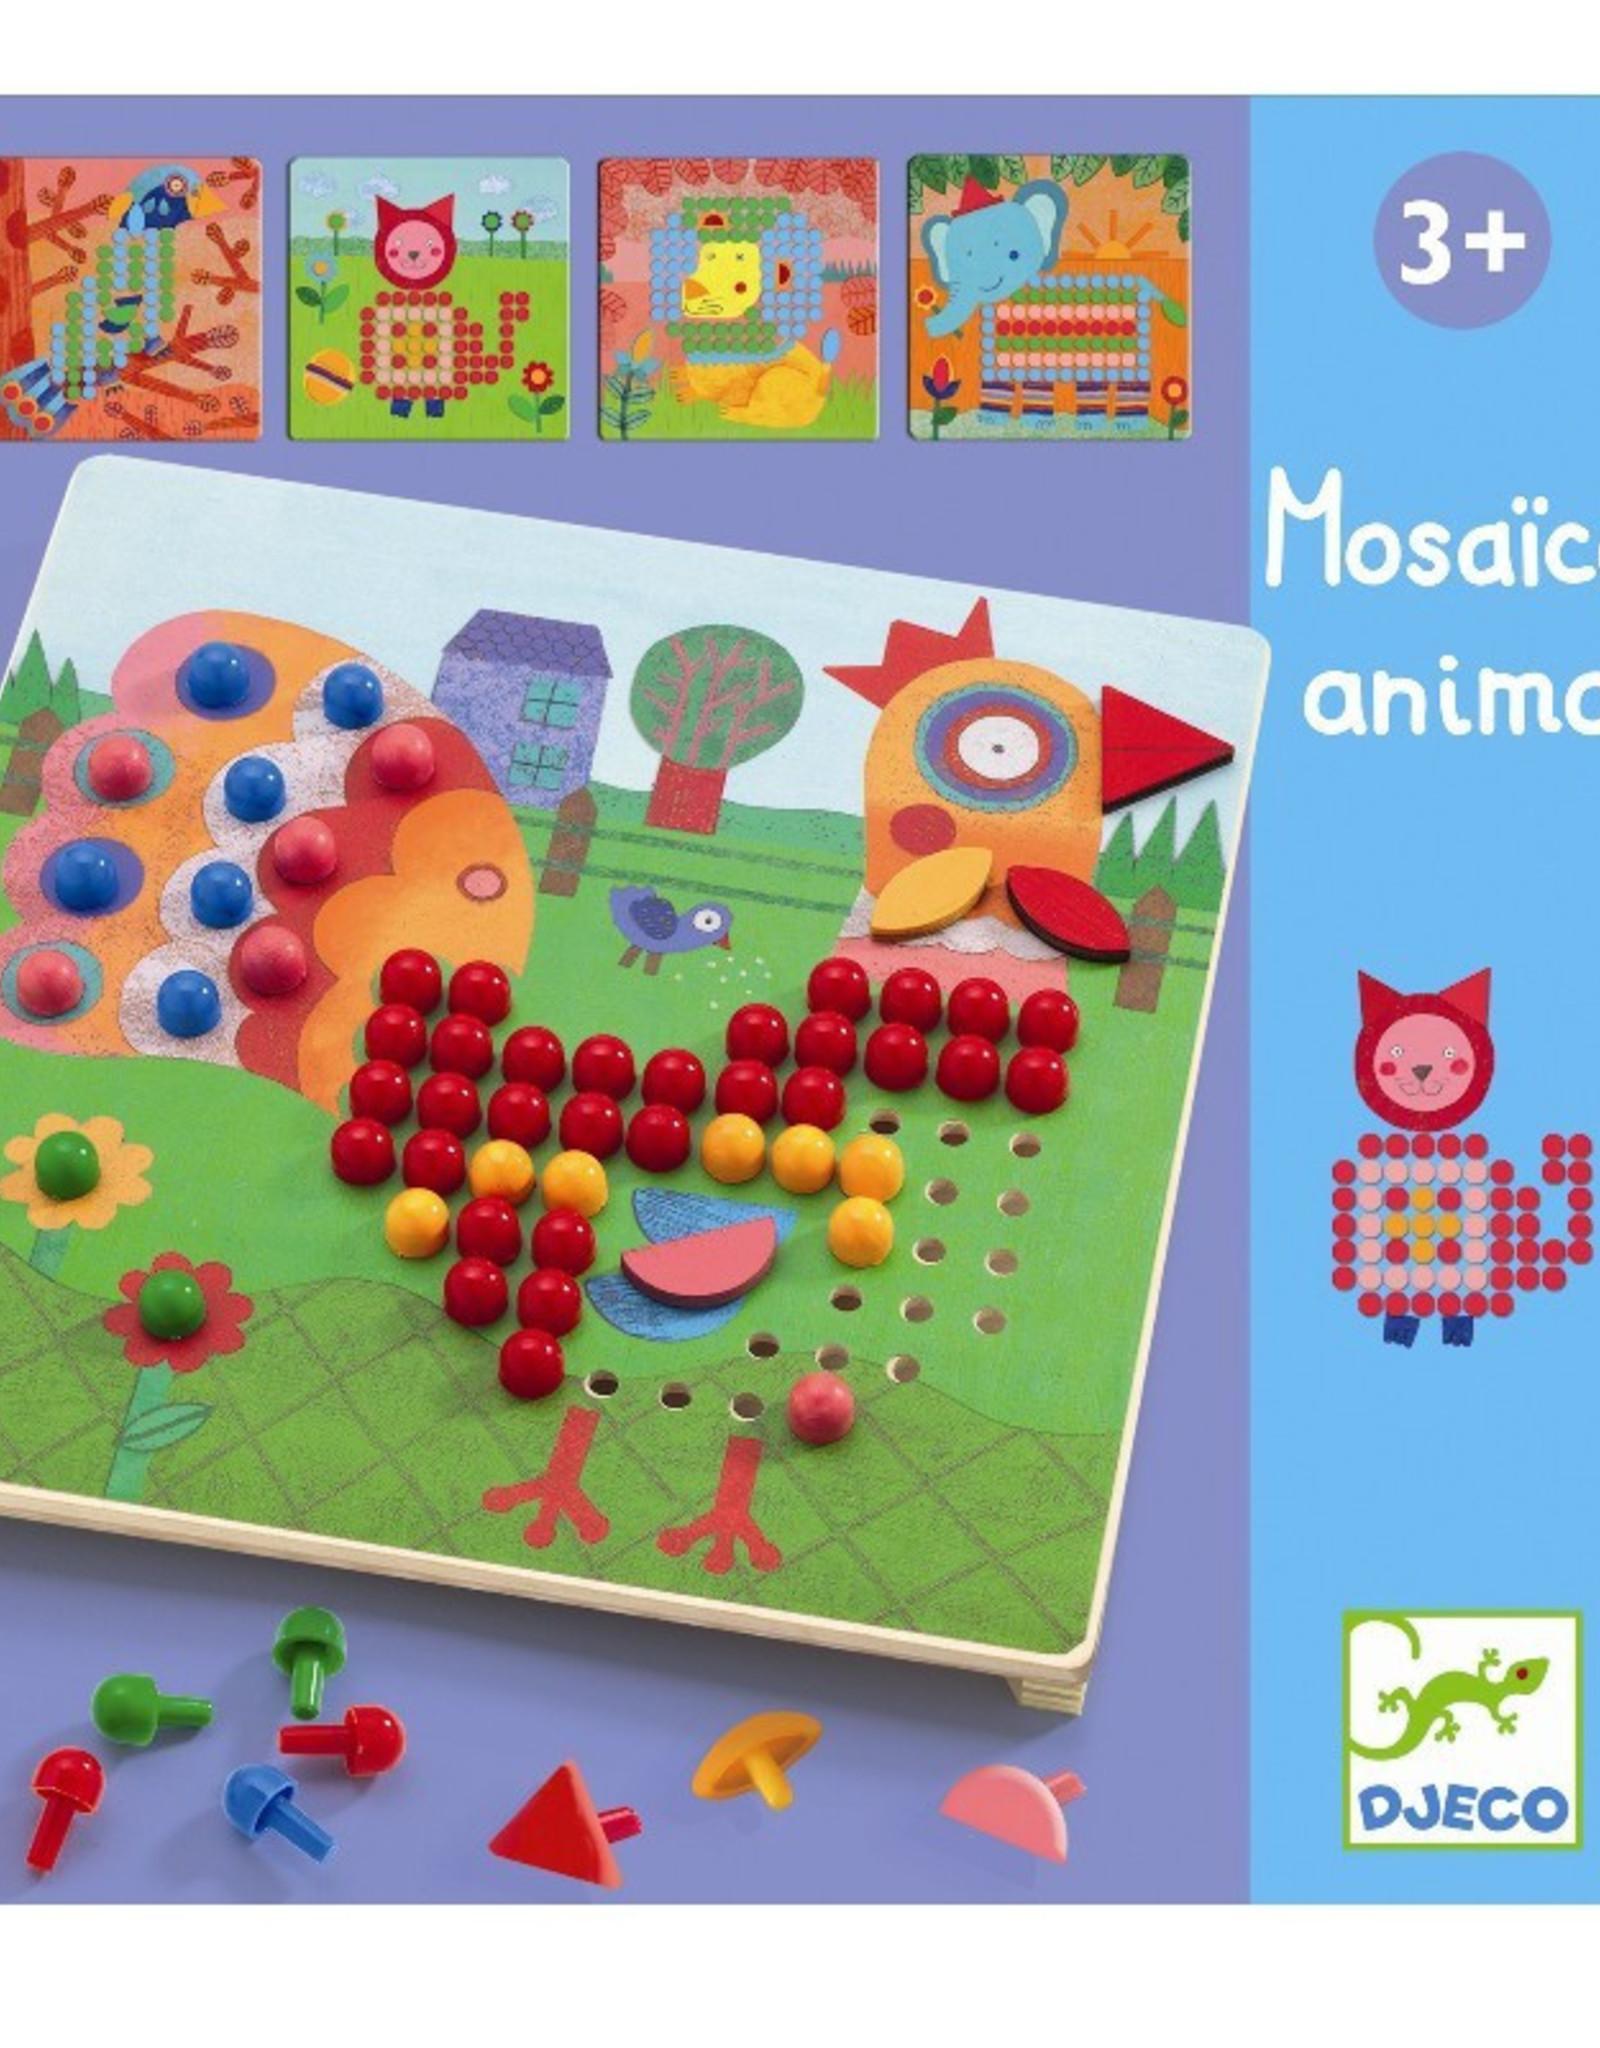 Djeco Mosaico Animo